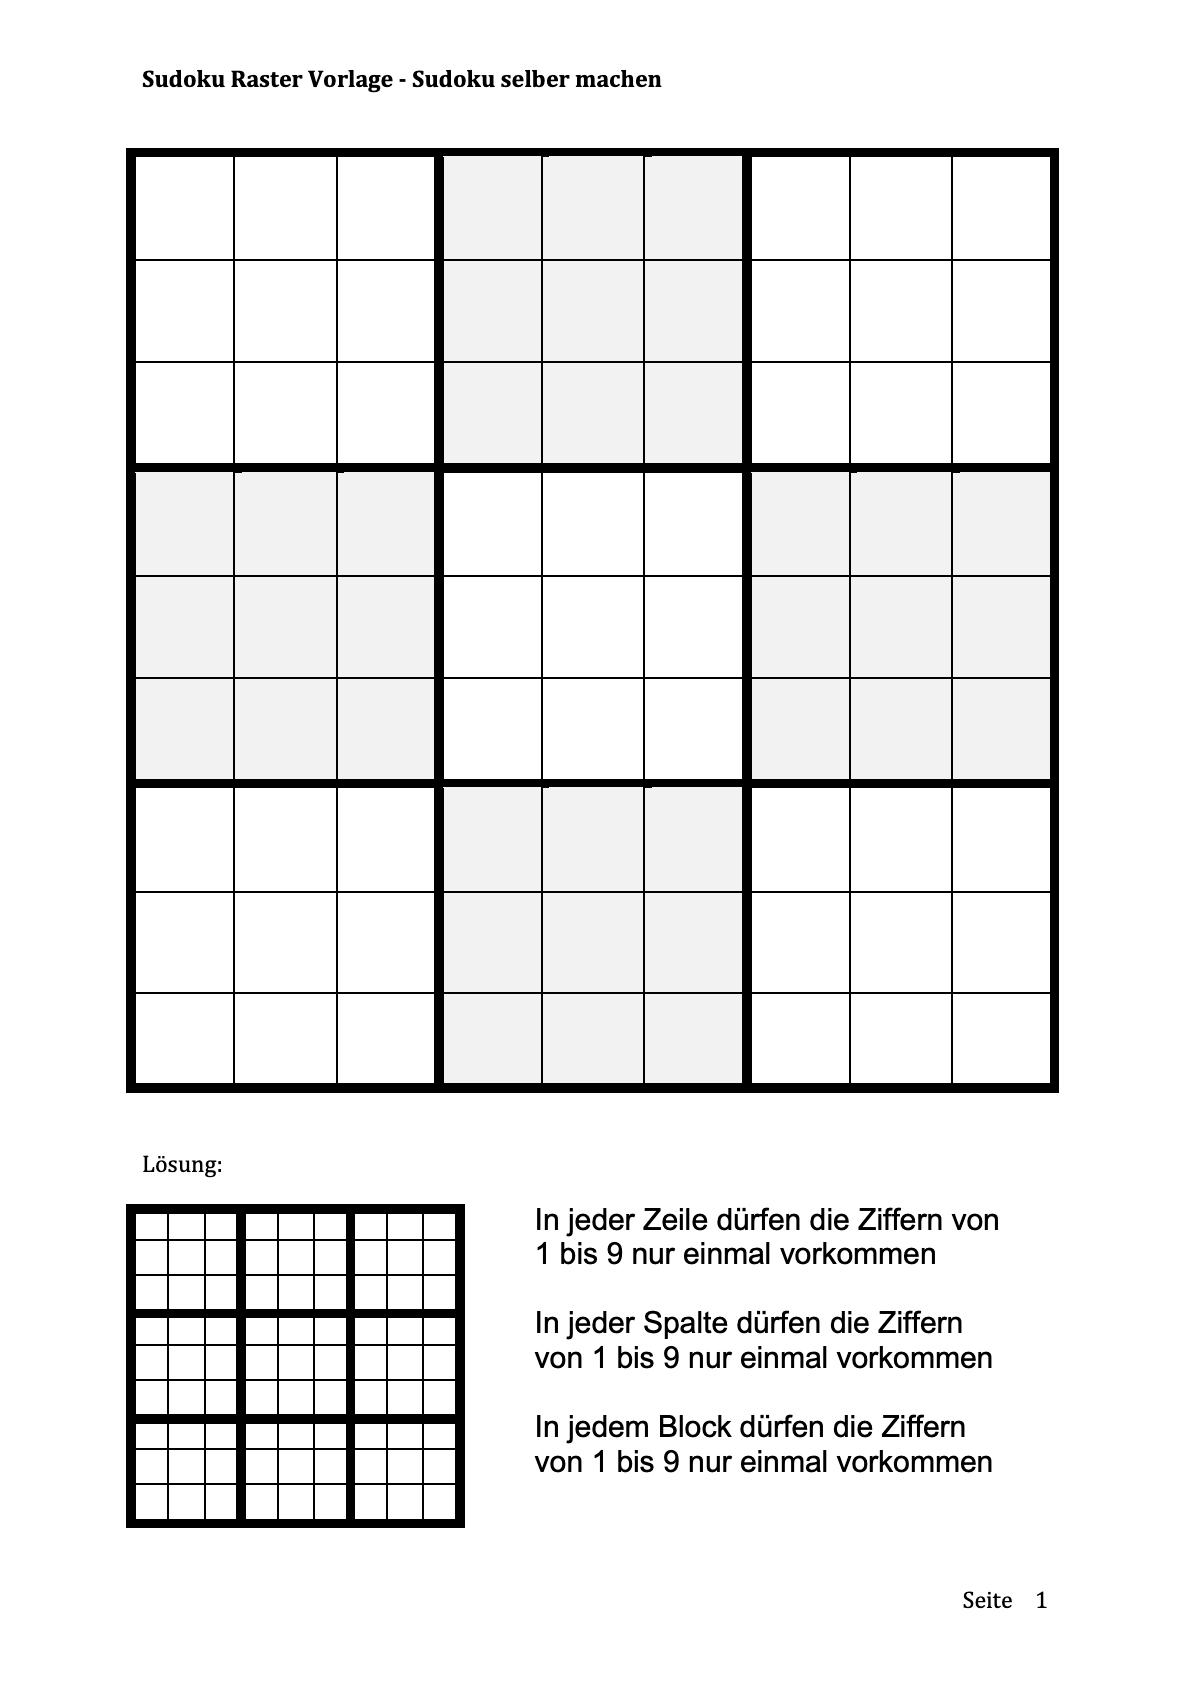 Sudoku Vorlage leer